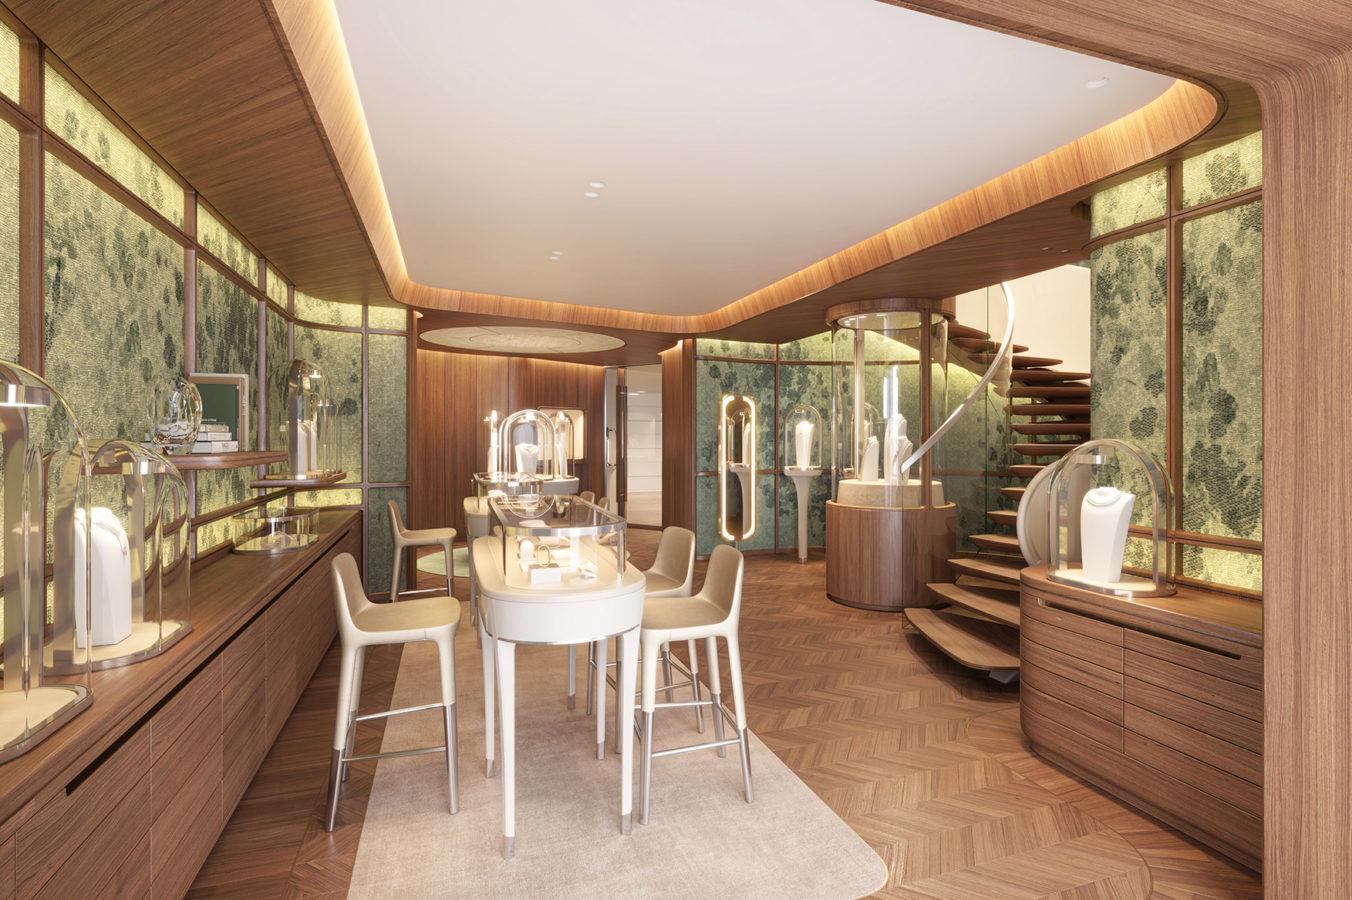 A Look Inside Van Cleef & Arpels' Revamped Hong Kong Flagship Boutique